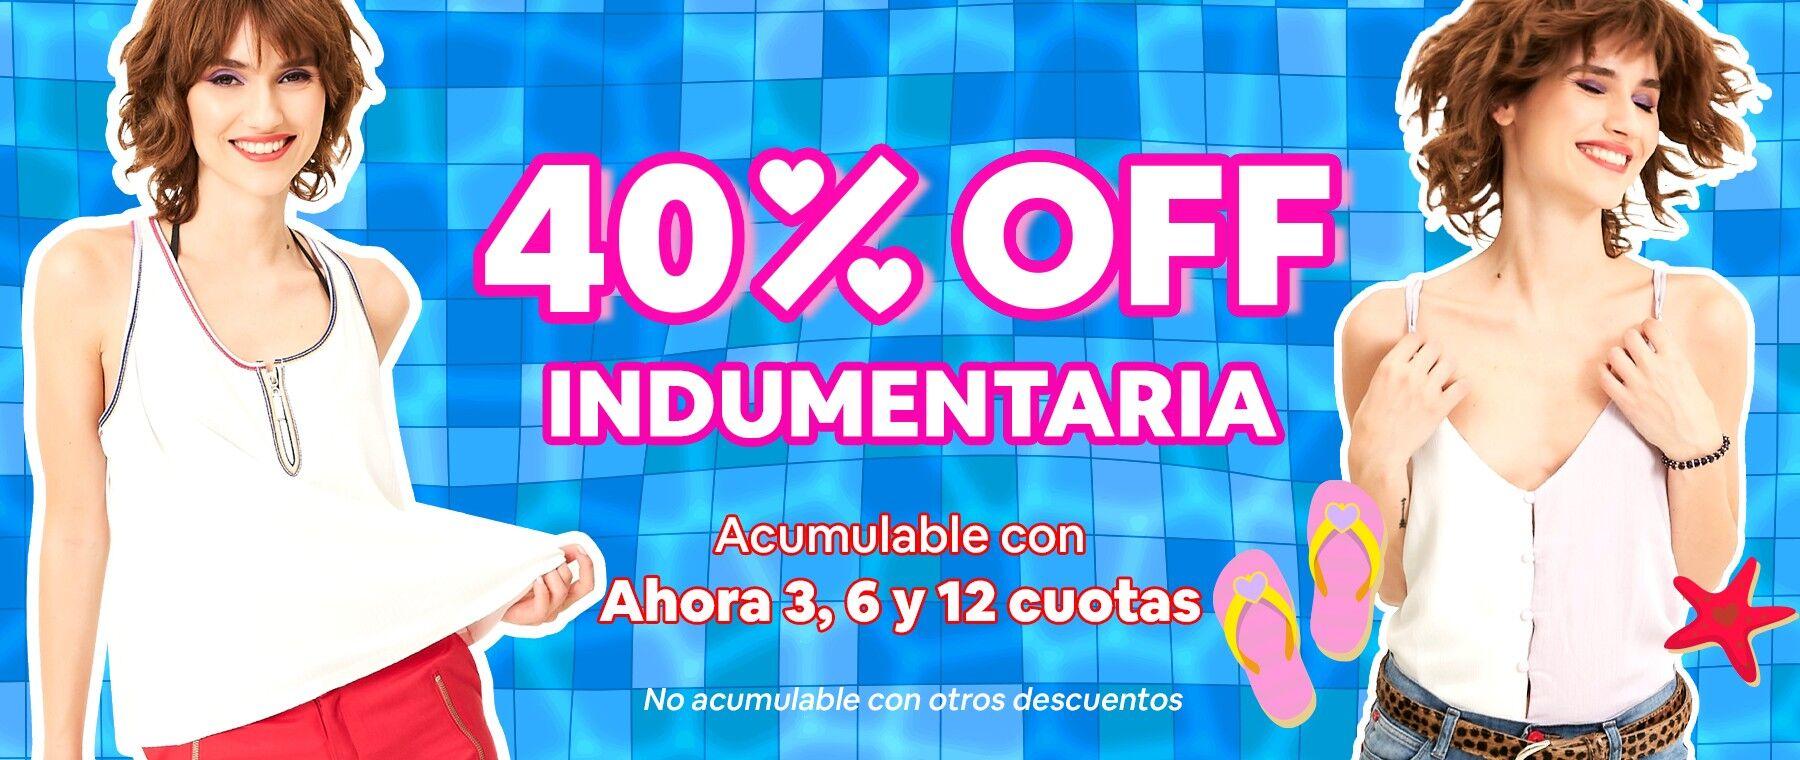 40%off indumentaria